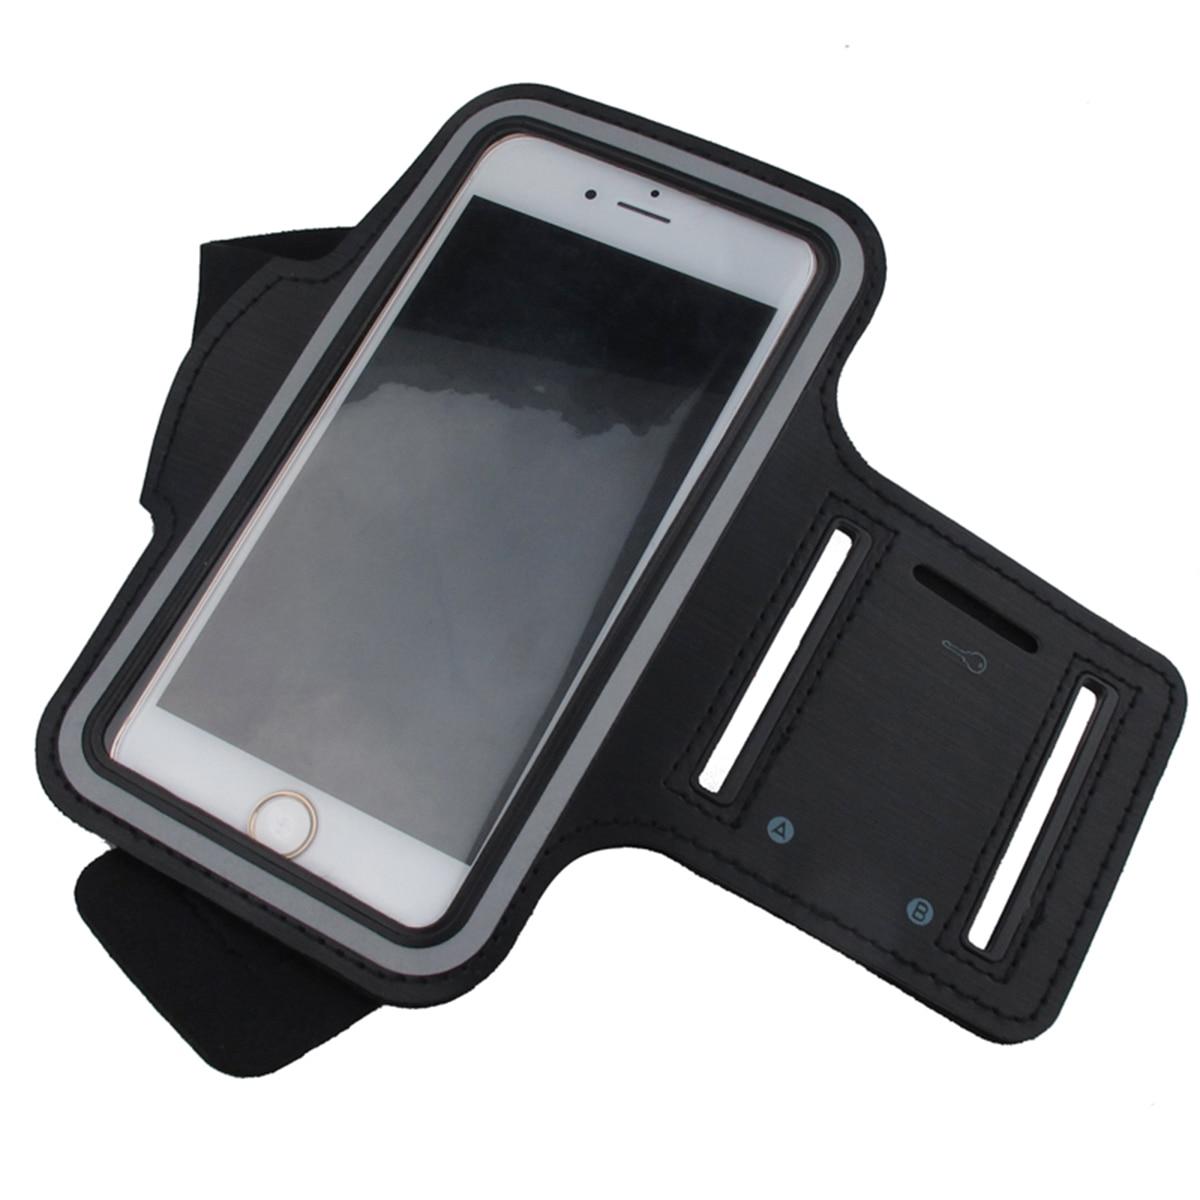 Brazo deportivo resistente al agua con teléfono móvil para iphone xiaomi huawei 5 pulgadas o menos equipado con bolsa de cinturón deportivo